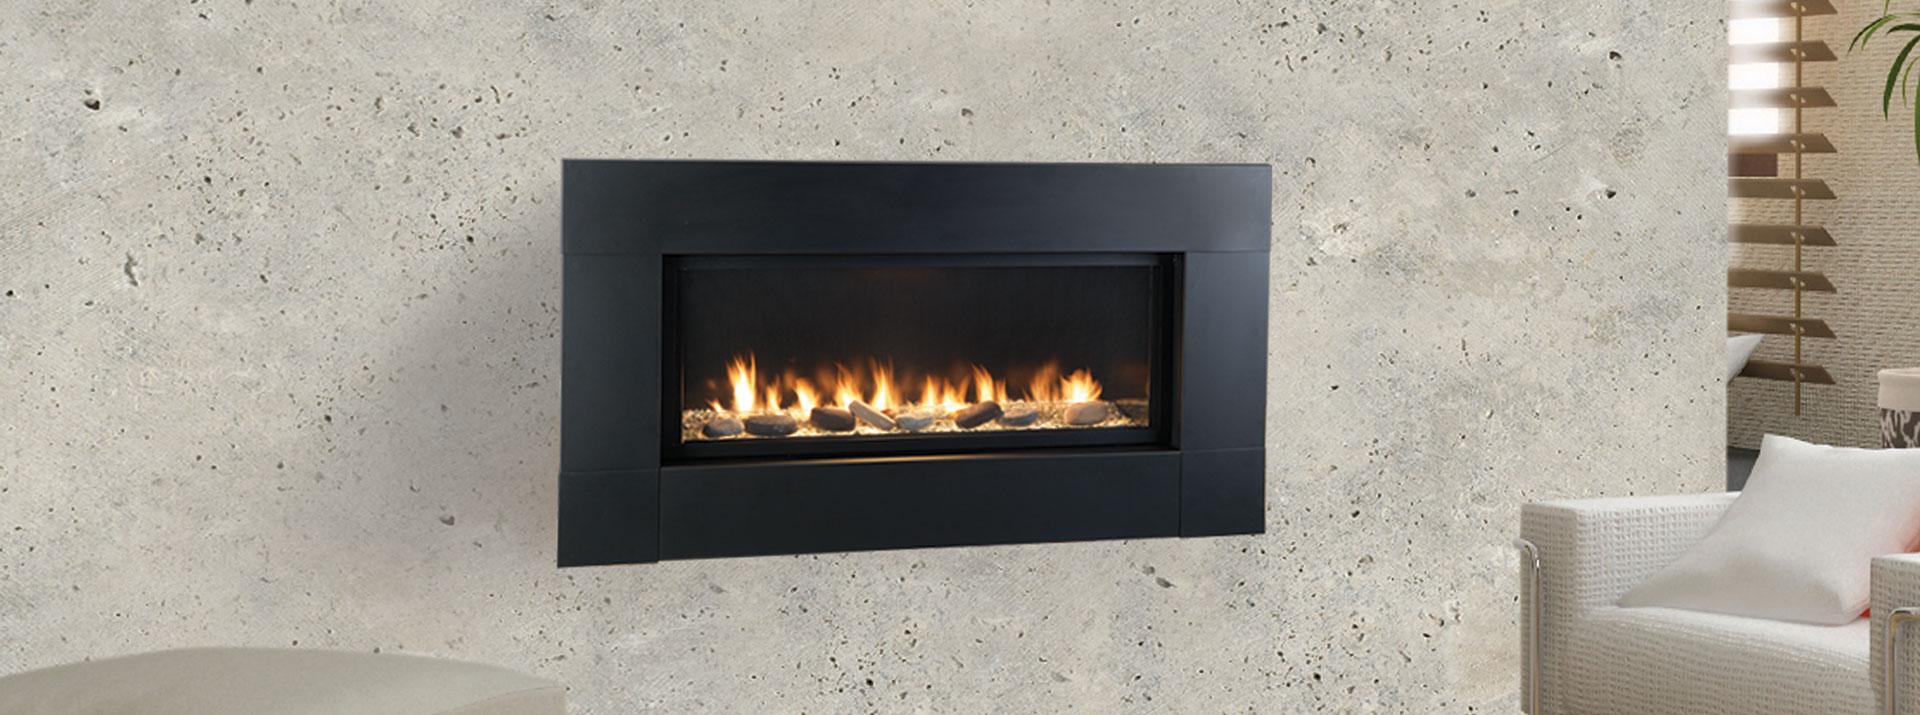 Artisan vent free gas fireplace